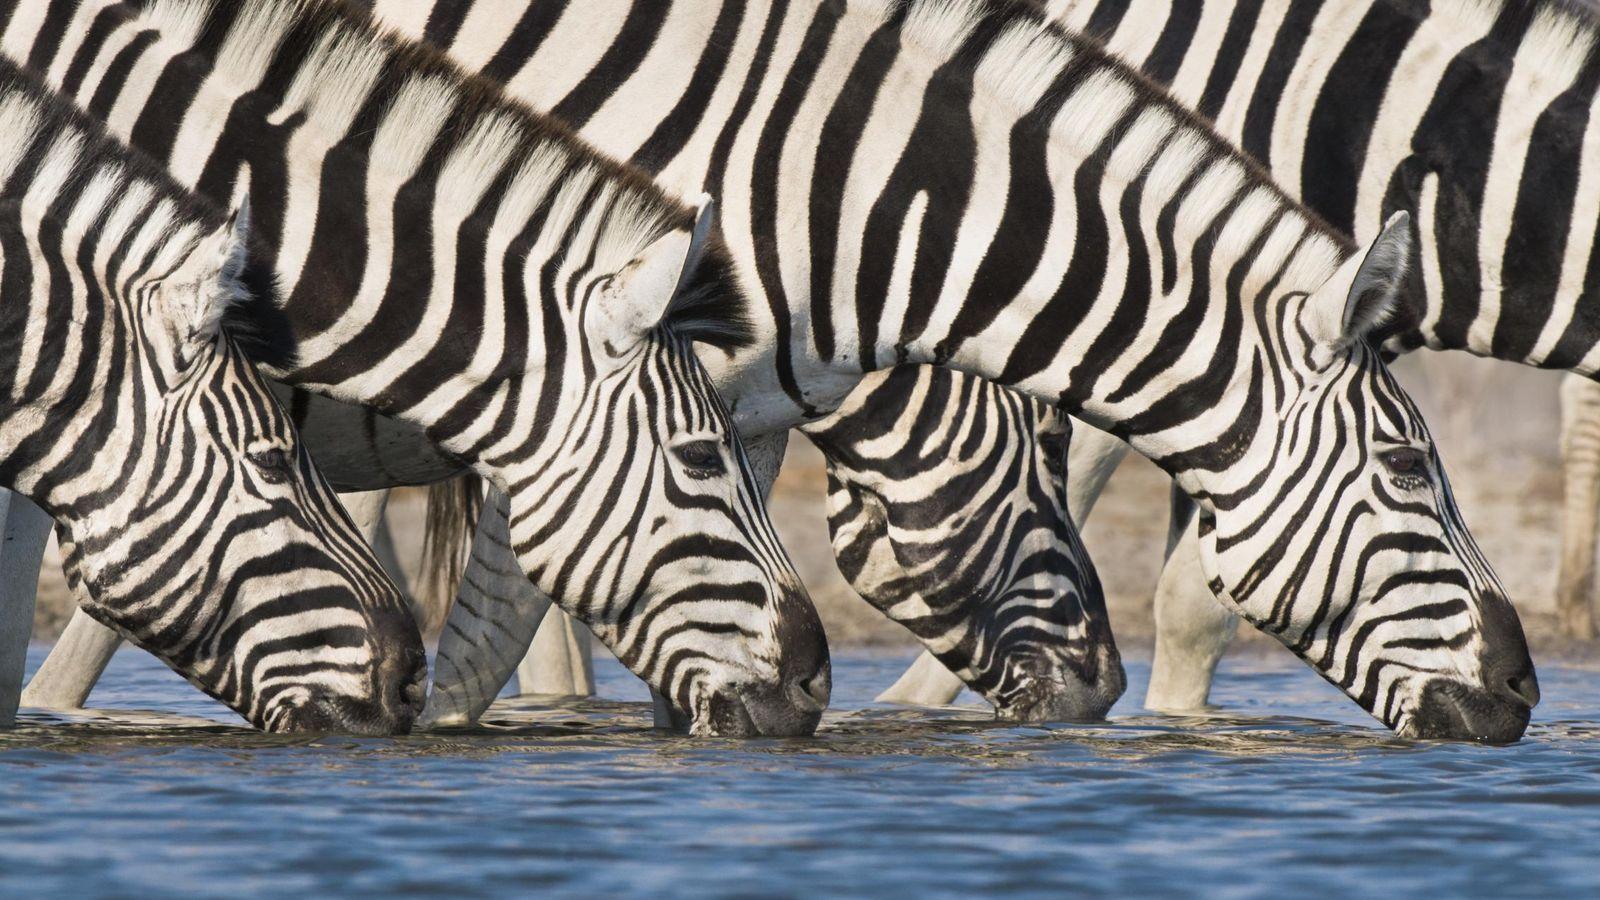 Zebra O Cebra Yahoo Animales: Las cebras.....